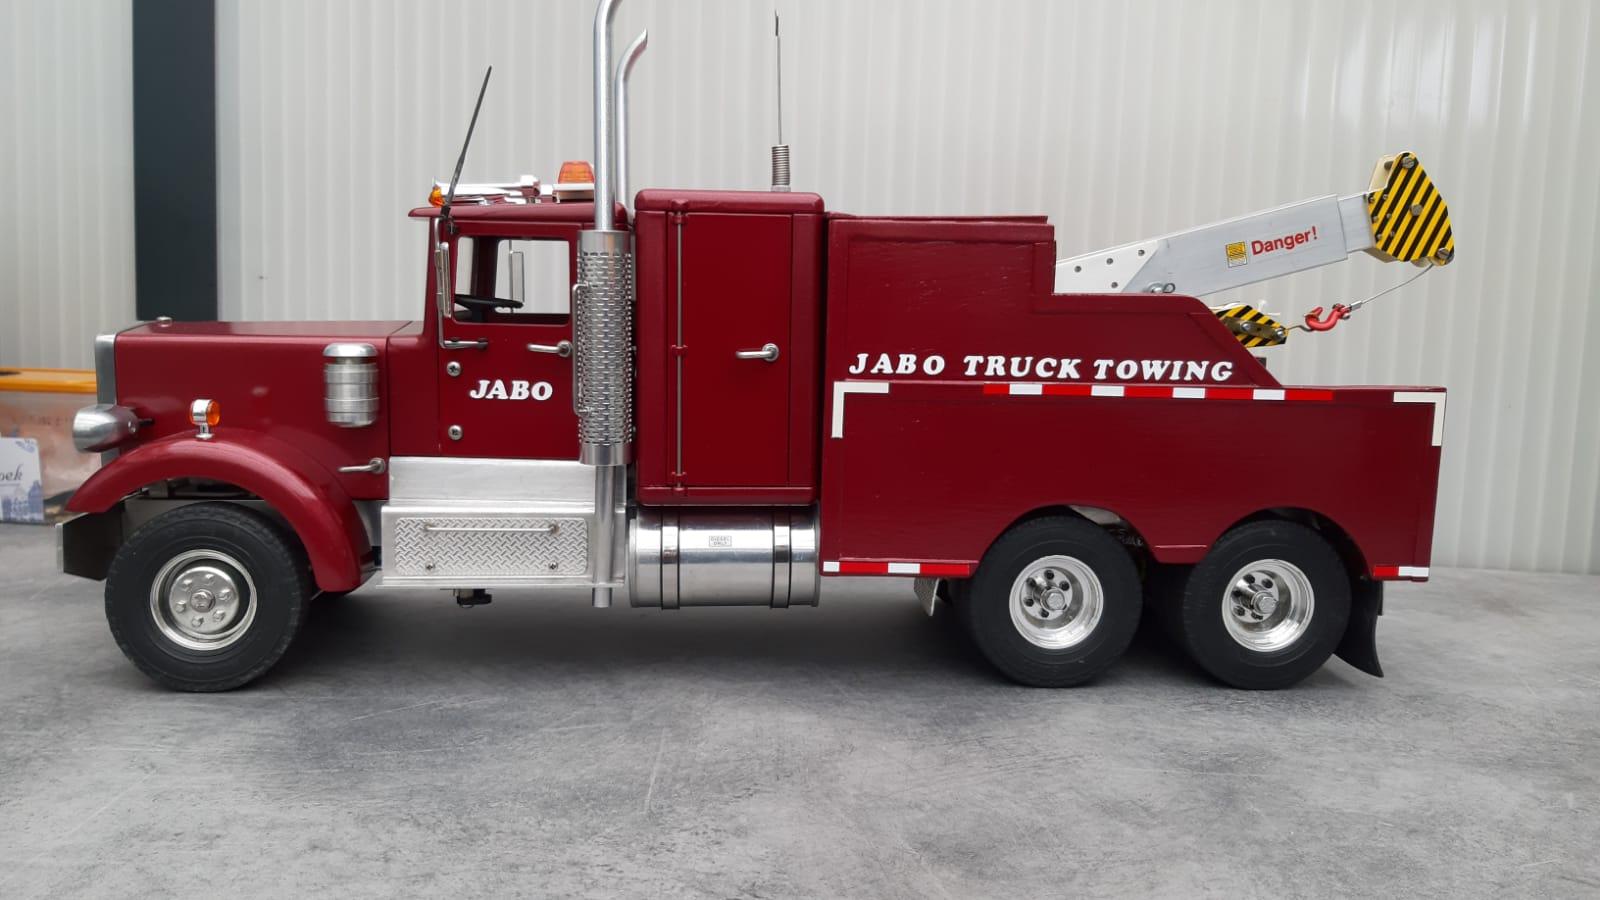 Peterbilt JaBo Tow Truck